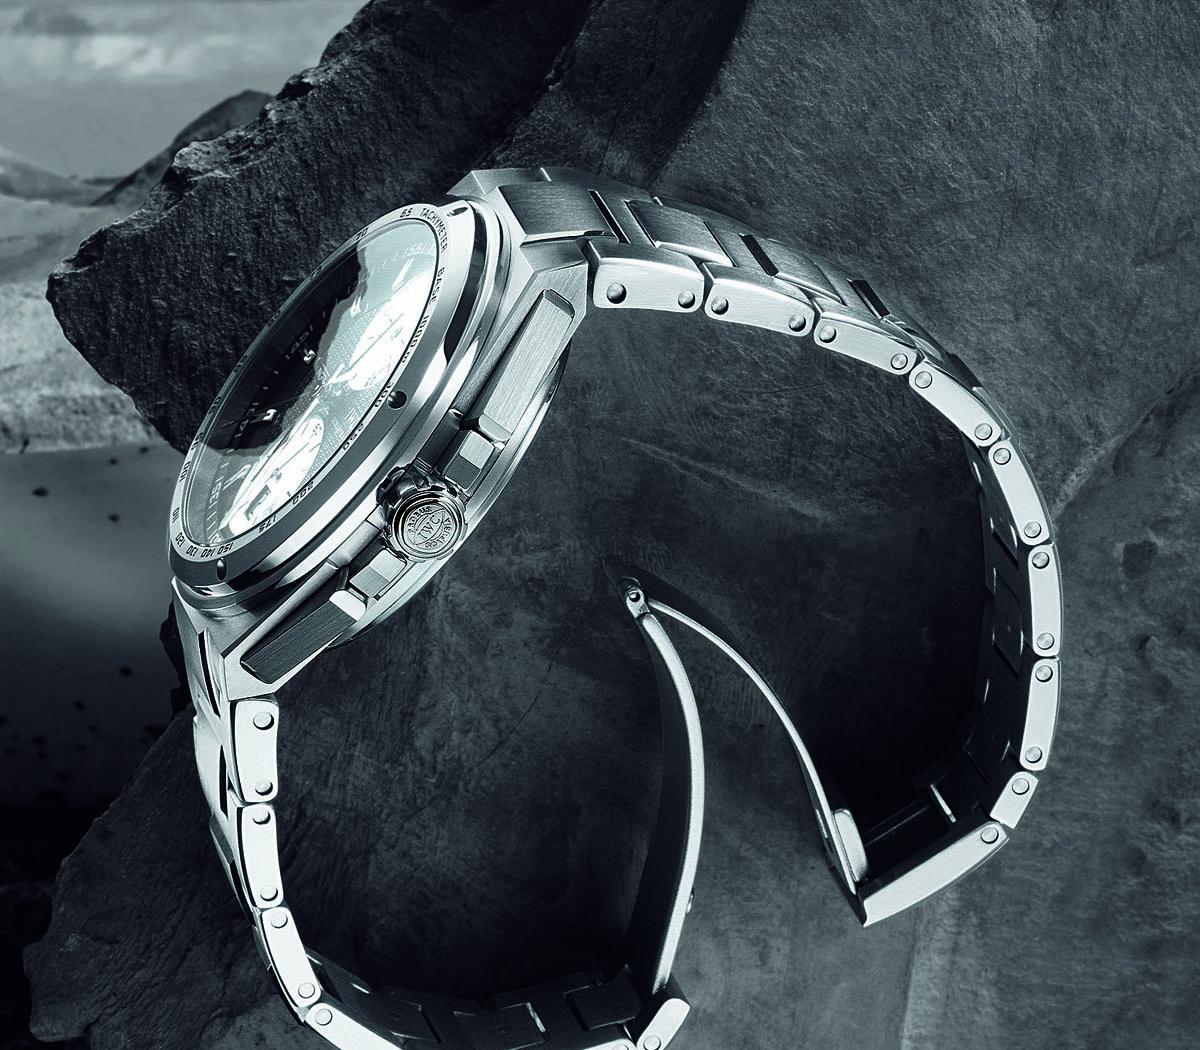 Comparative Review - Breitling Chronomat B01 vs. IWC Ingenieur Chronograph - 6